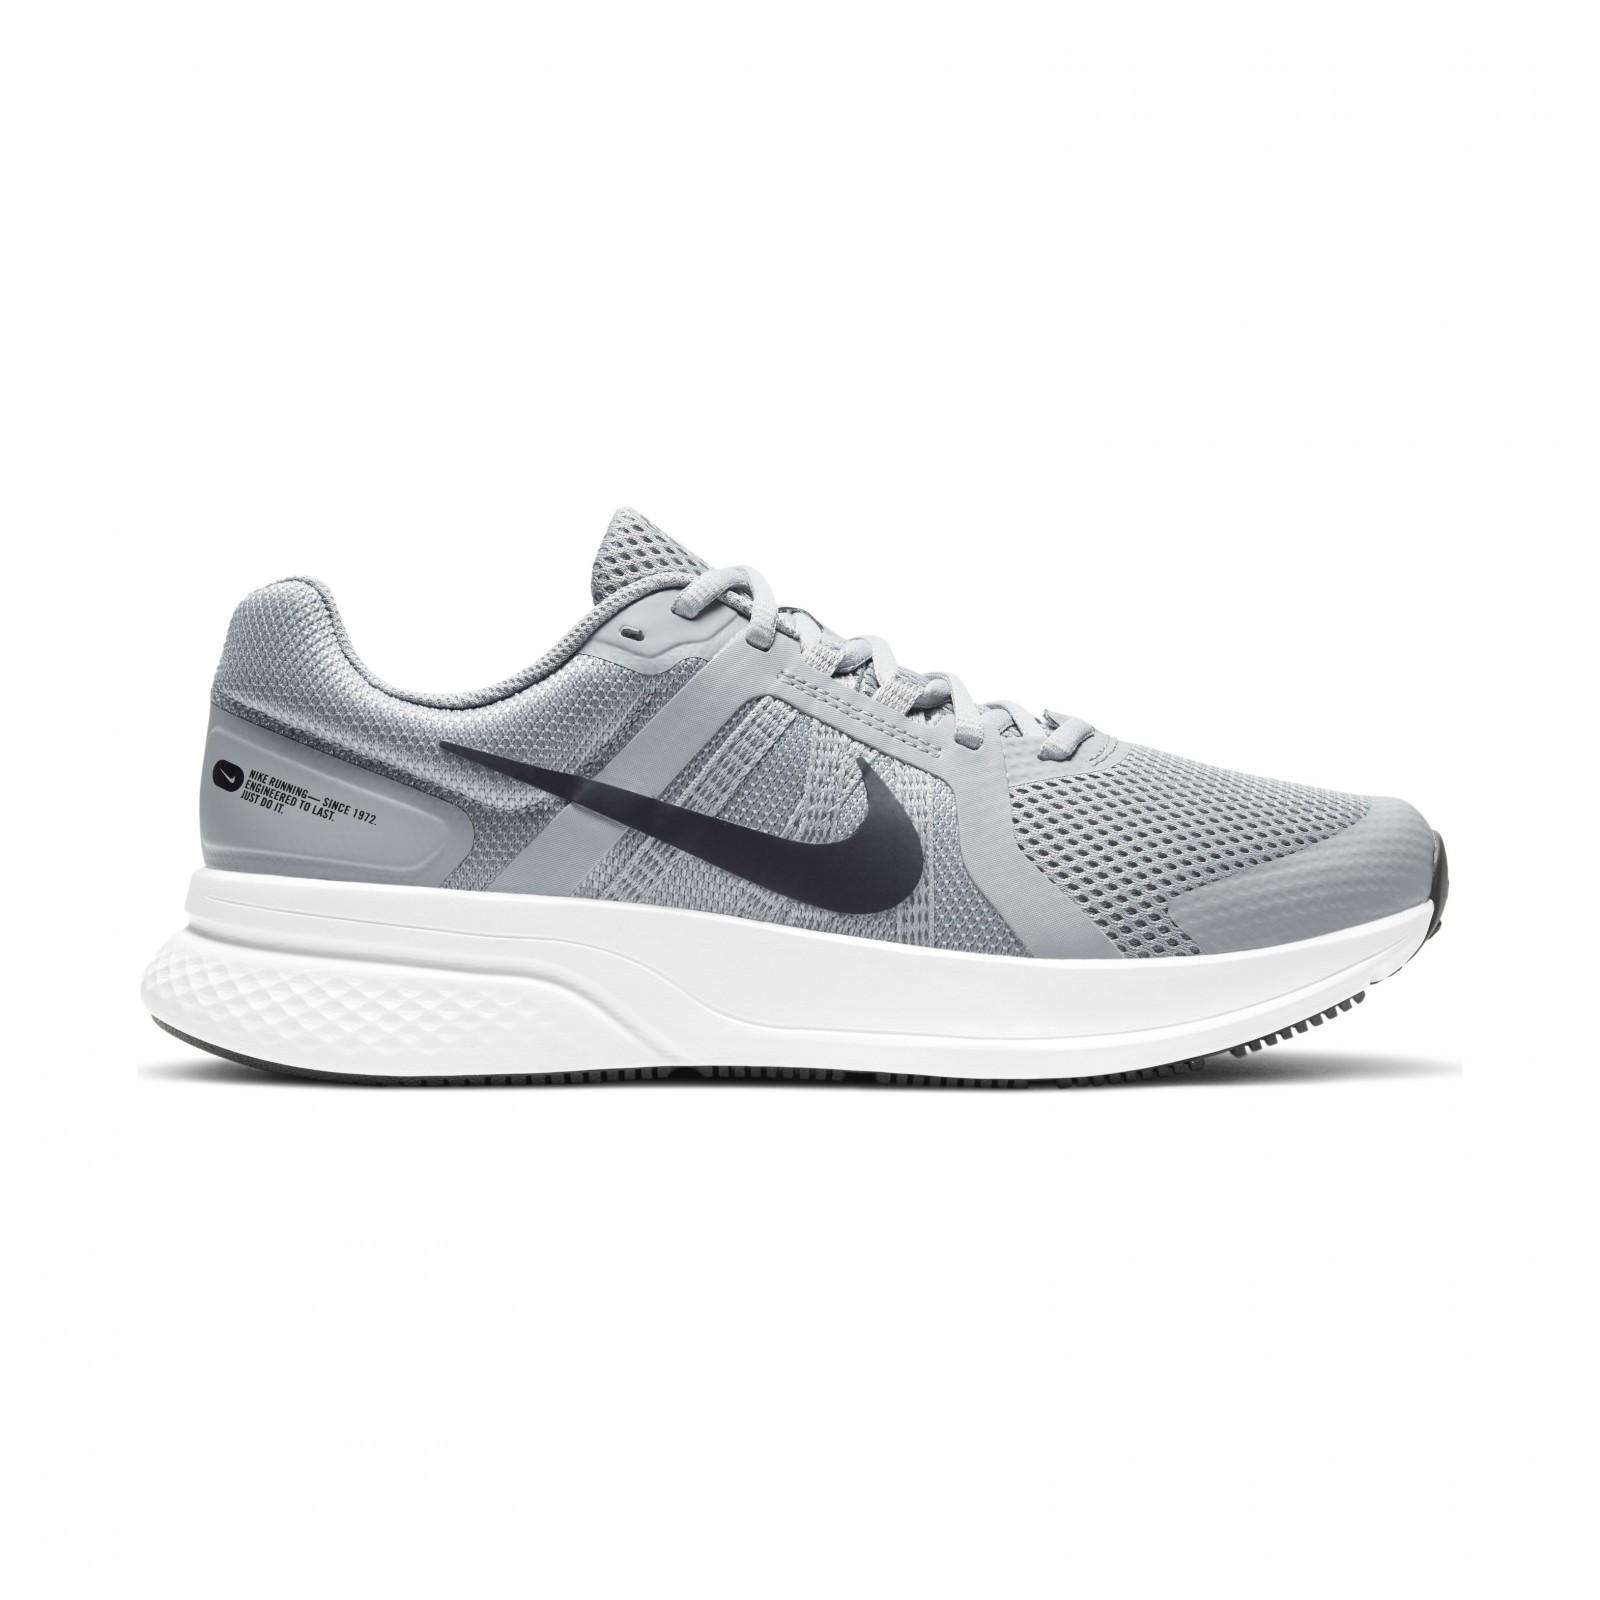 Nike Run Swift 2 PARTICLE GREY/BLACK-WHITE